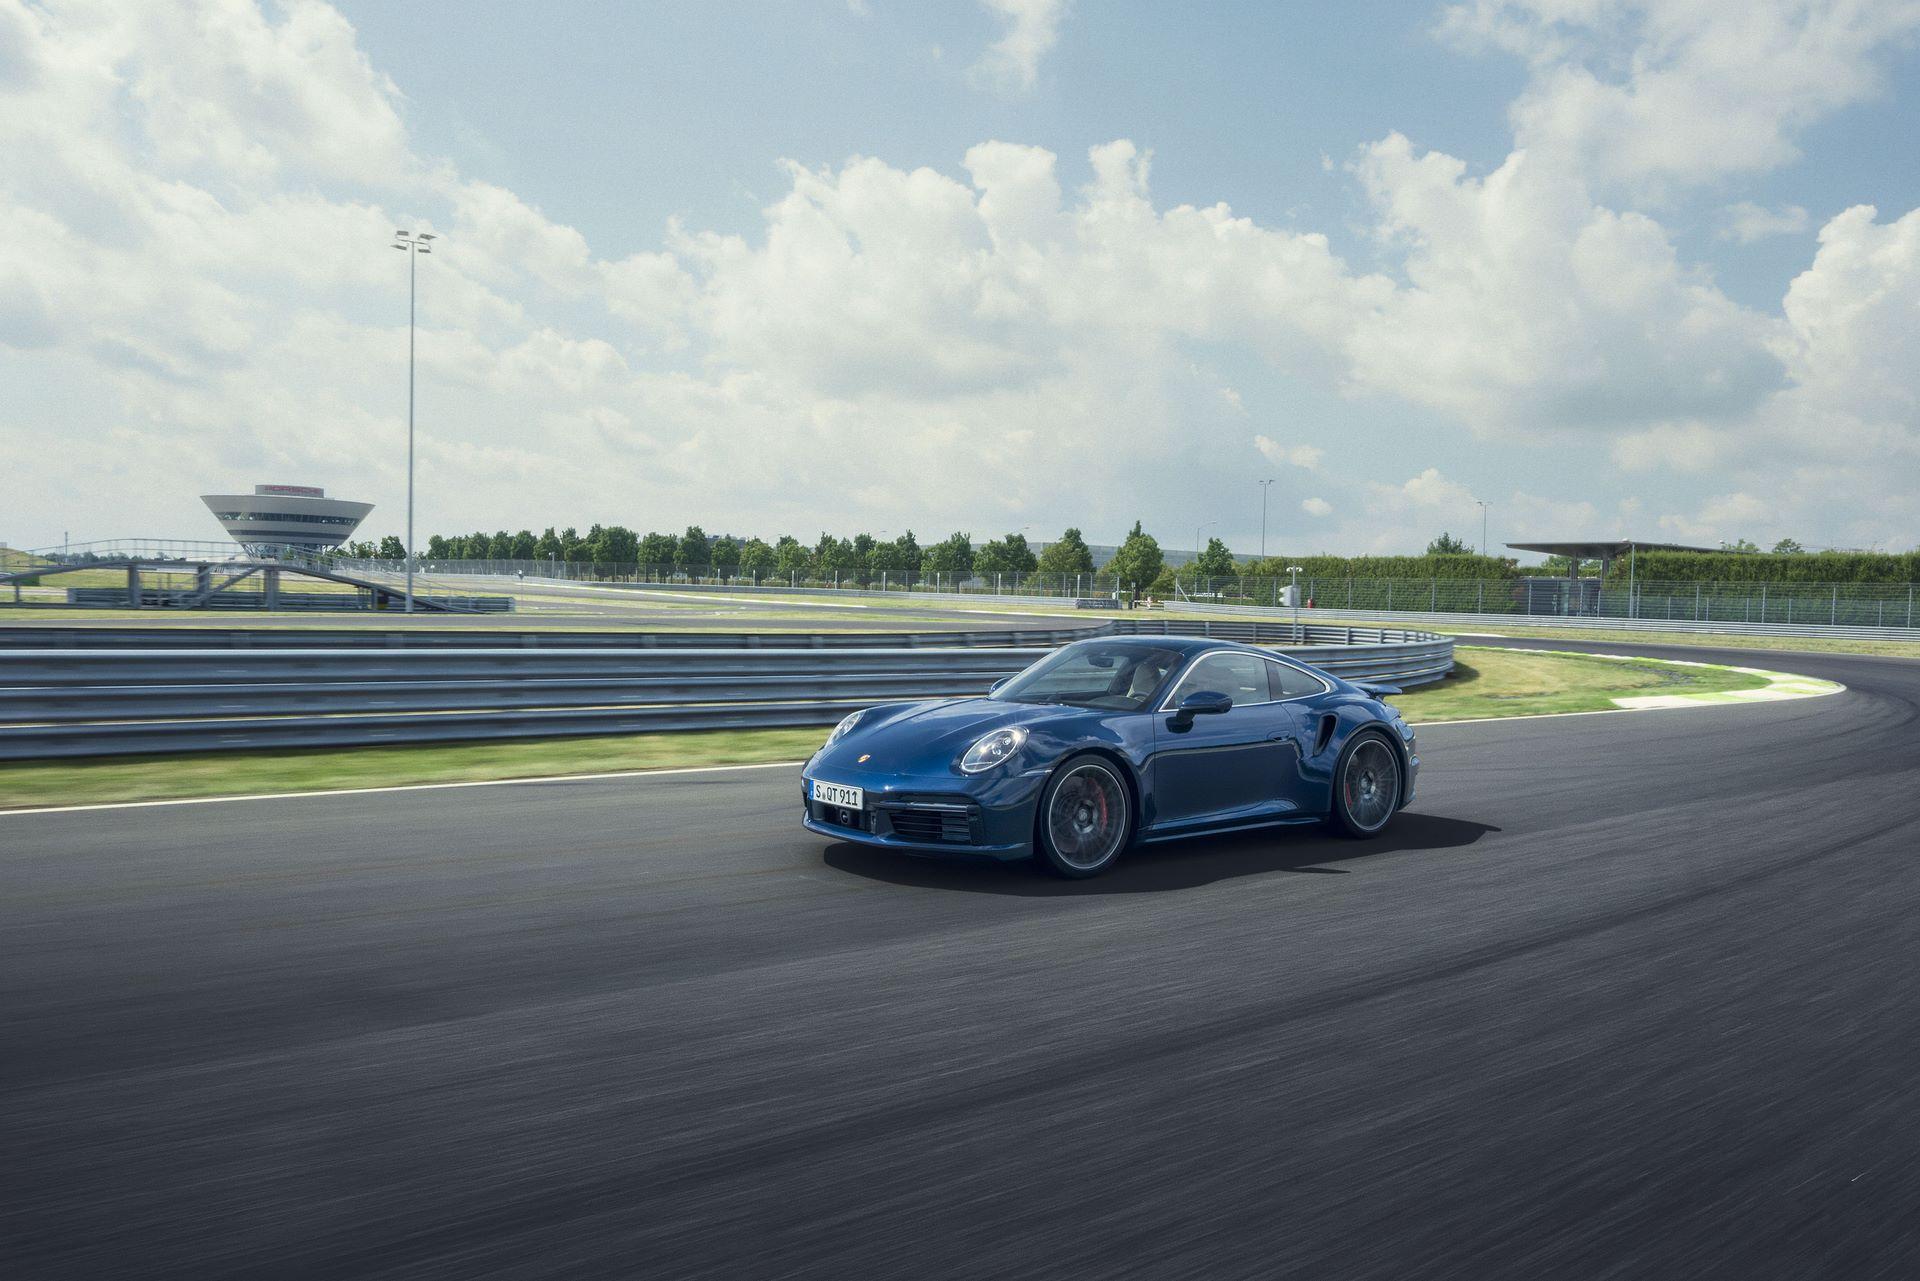 Porsche-911-Turbo-2020-12